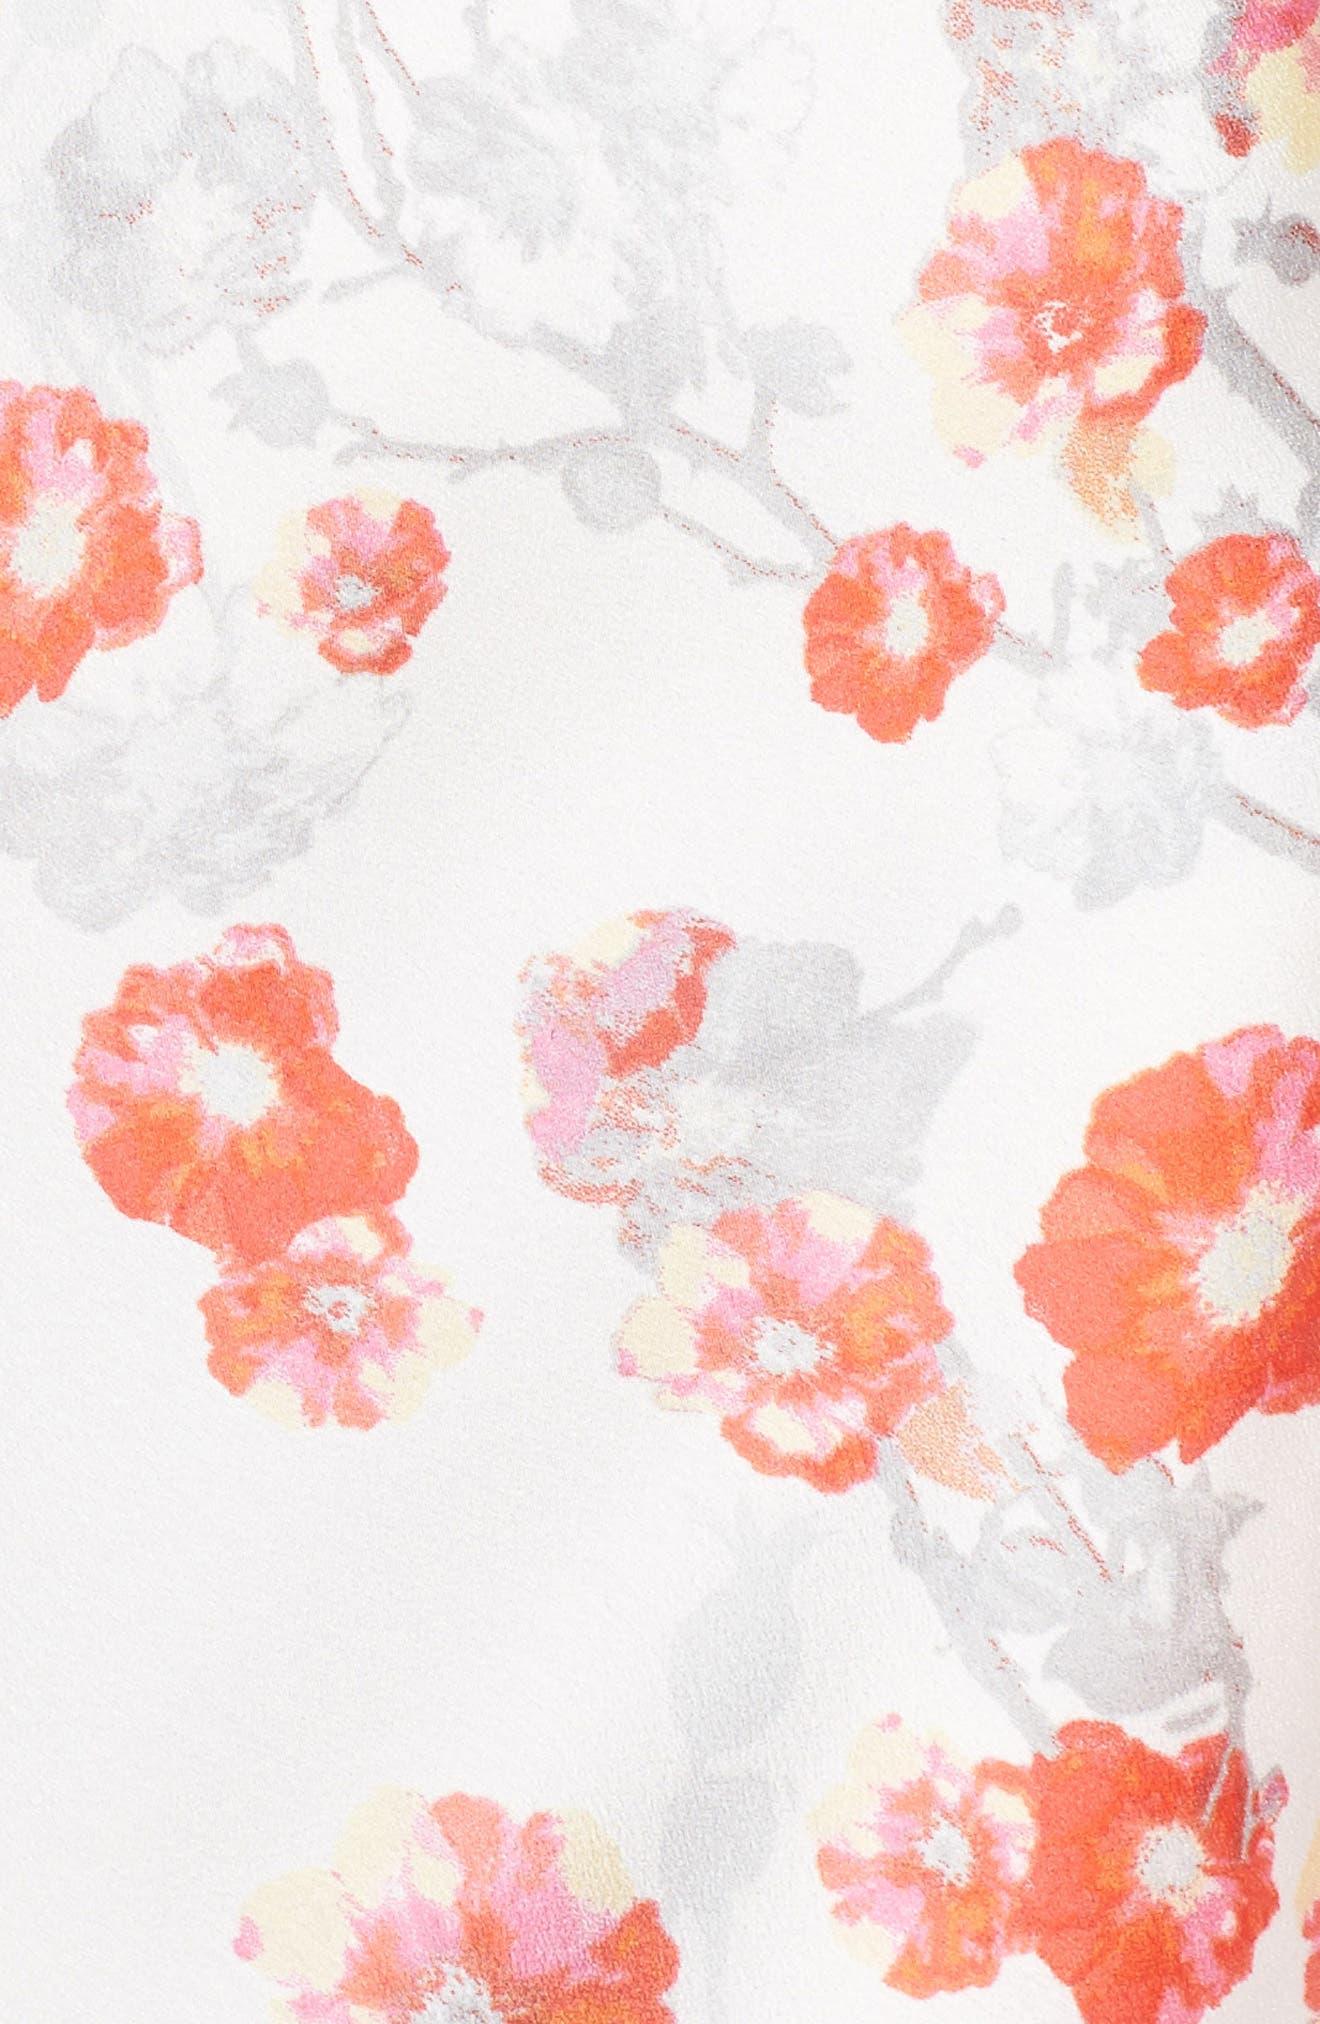 Blossom Print Satin Chemise,                             Alternate thumbnail 6, color,                             White/ Multi